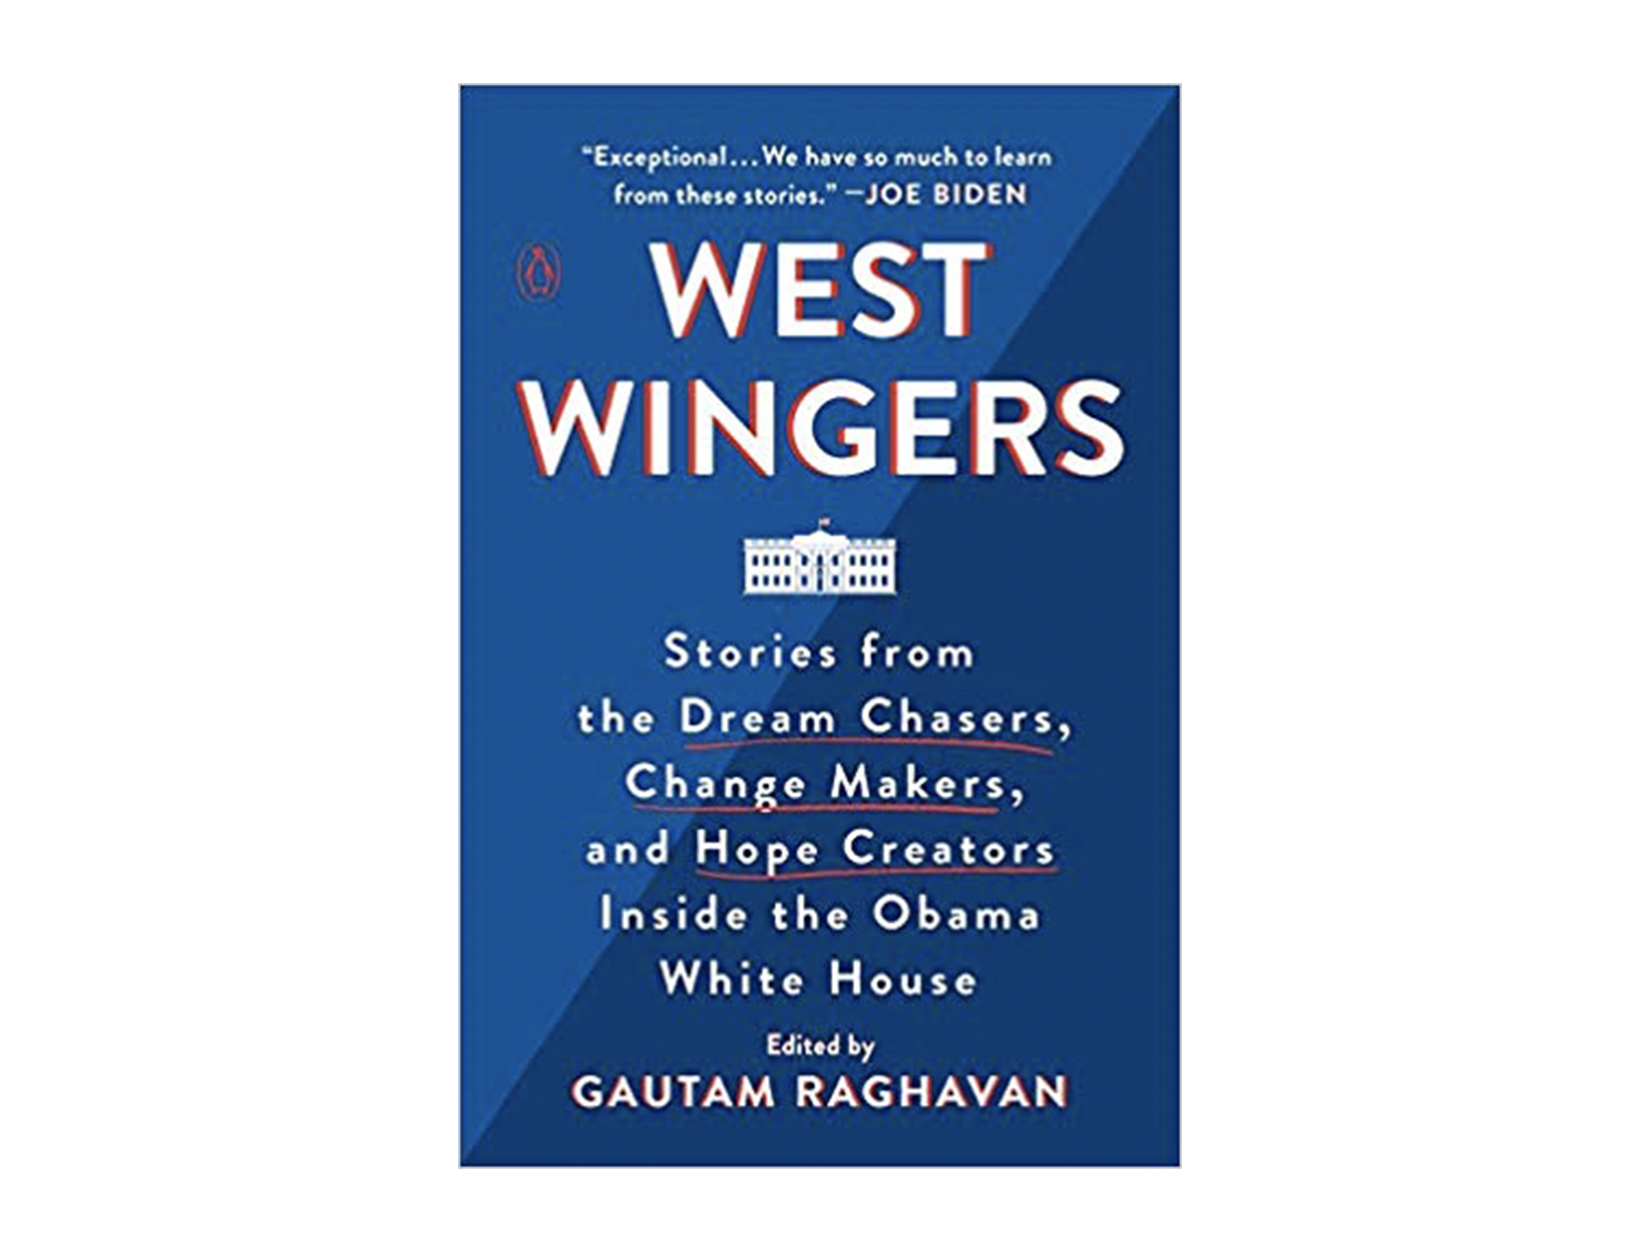 <em>West Wingers</em> edited by Gautam Raghavan